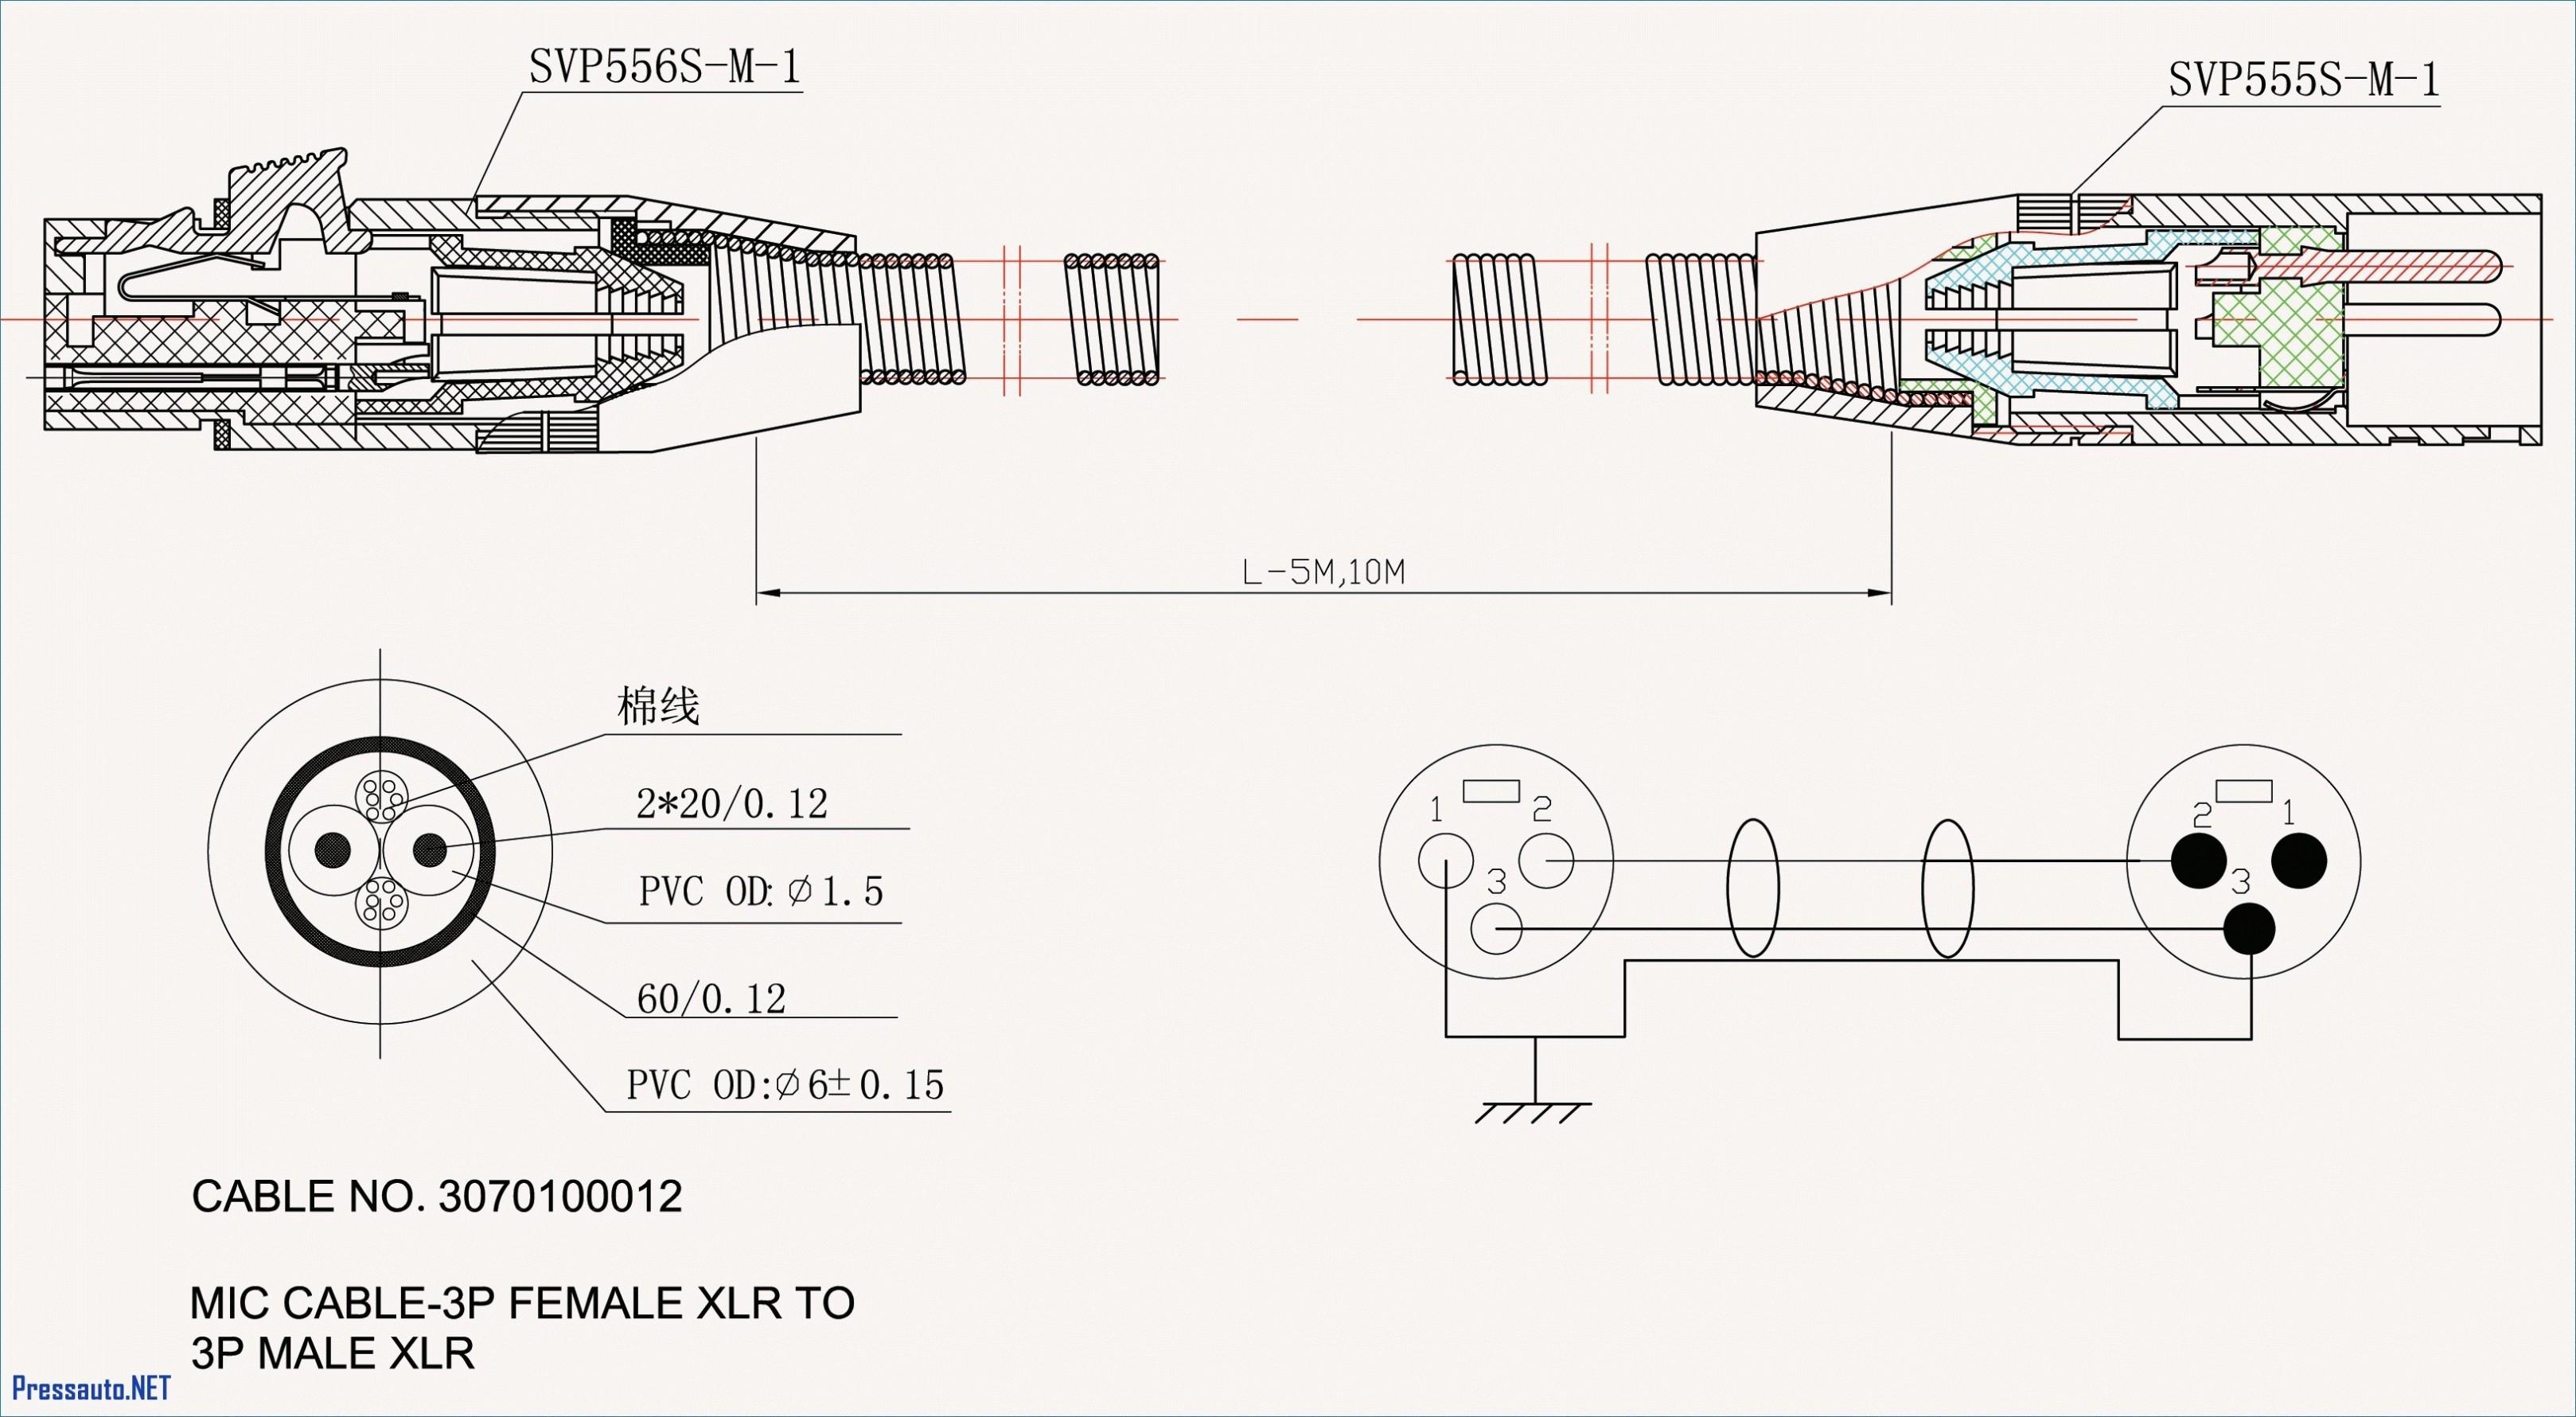 2001 toyota Highlander Engine Diagram Vehicle Wiring Diagrams V4 2 Wiring Diagram toolbox Of 2001 toyota Highlander Engine Diagram